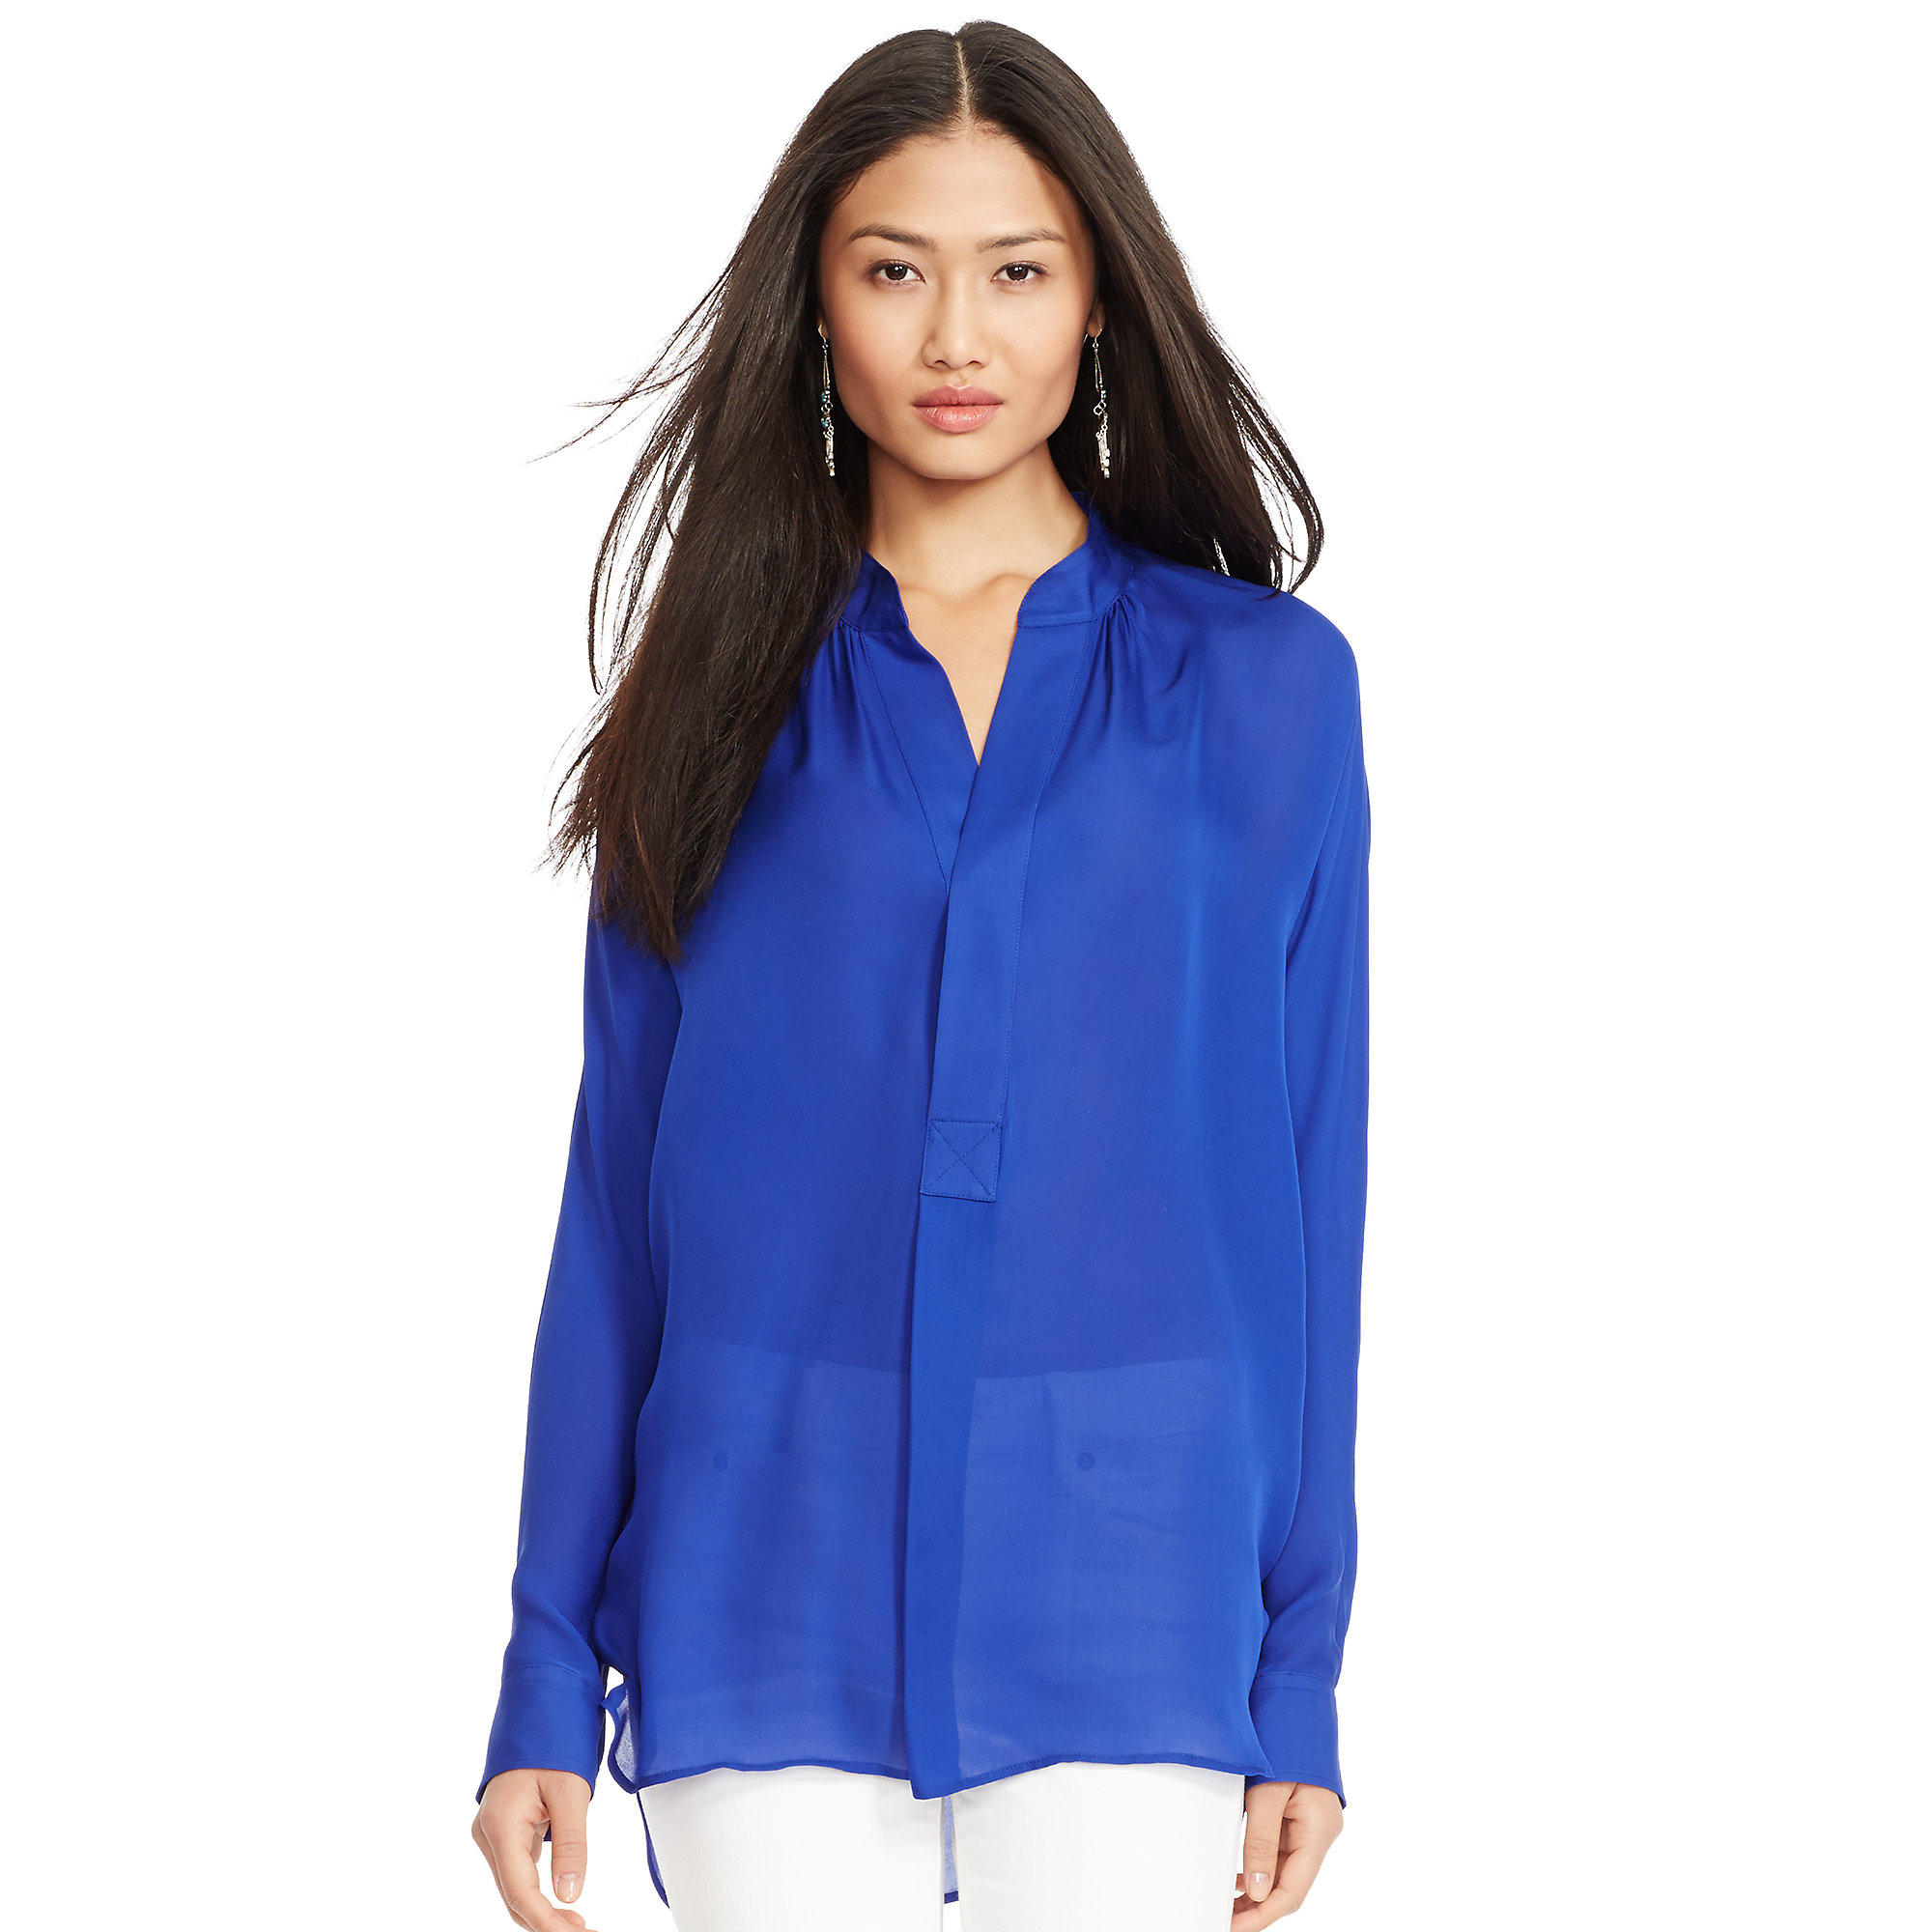 2d9e6a99a63319 Lyst - Polo Ralph Lauren Silk Georgette Blouse in Blue